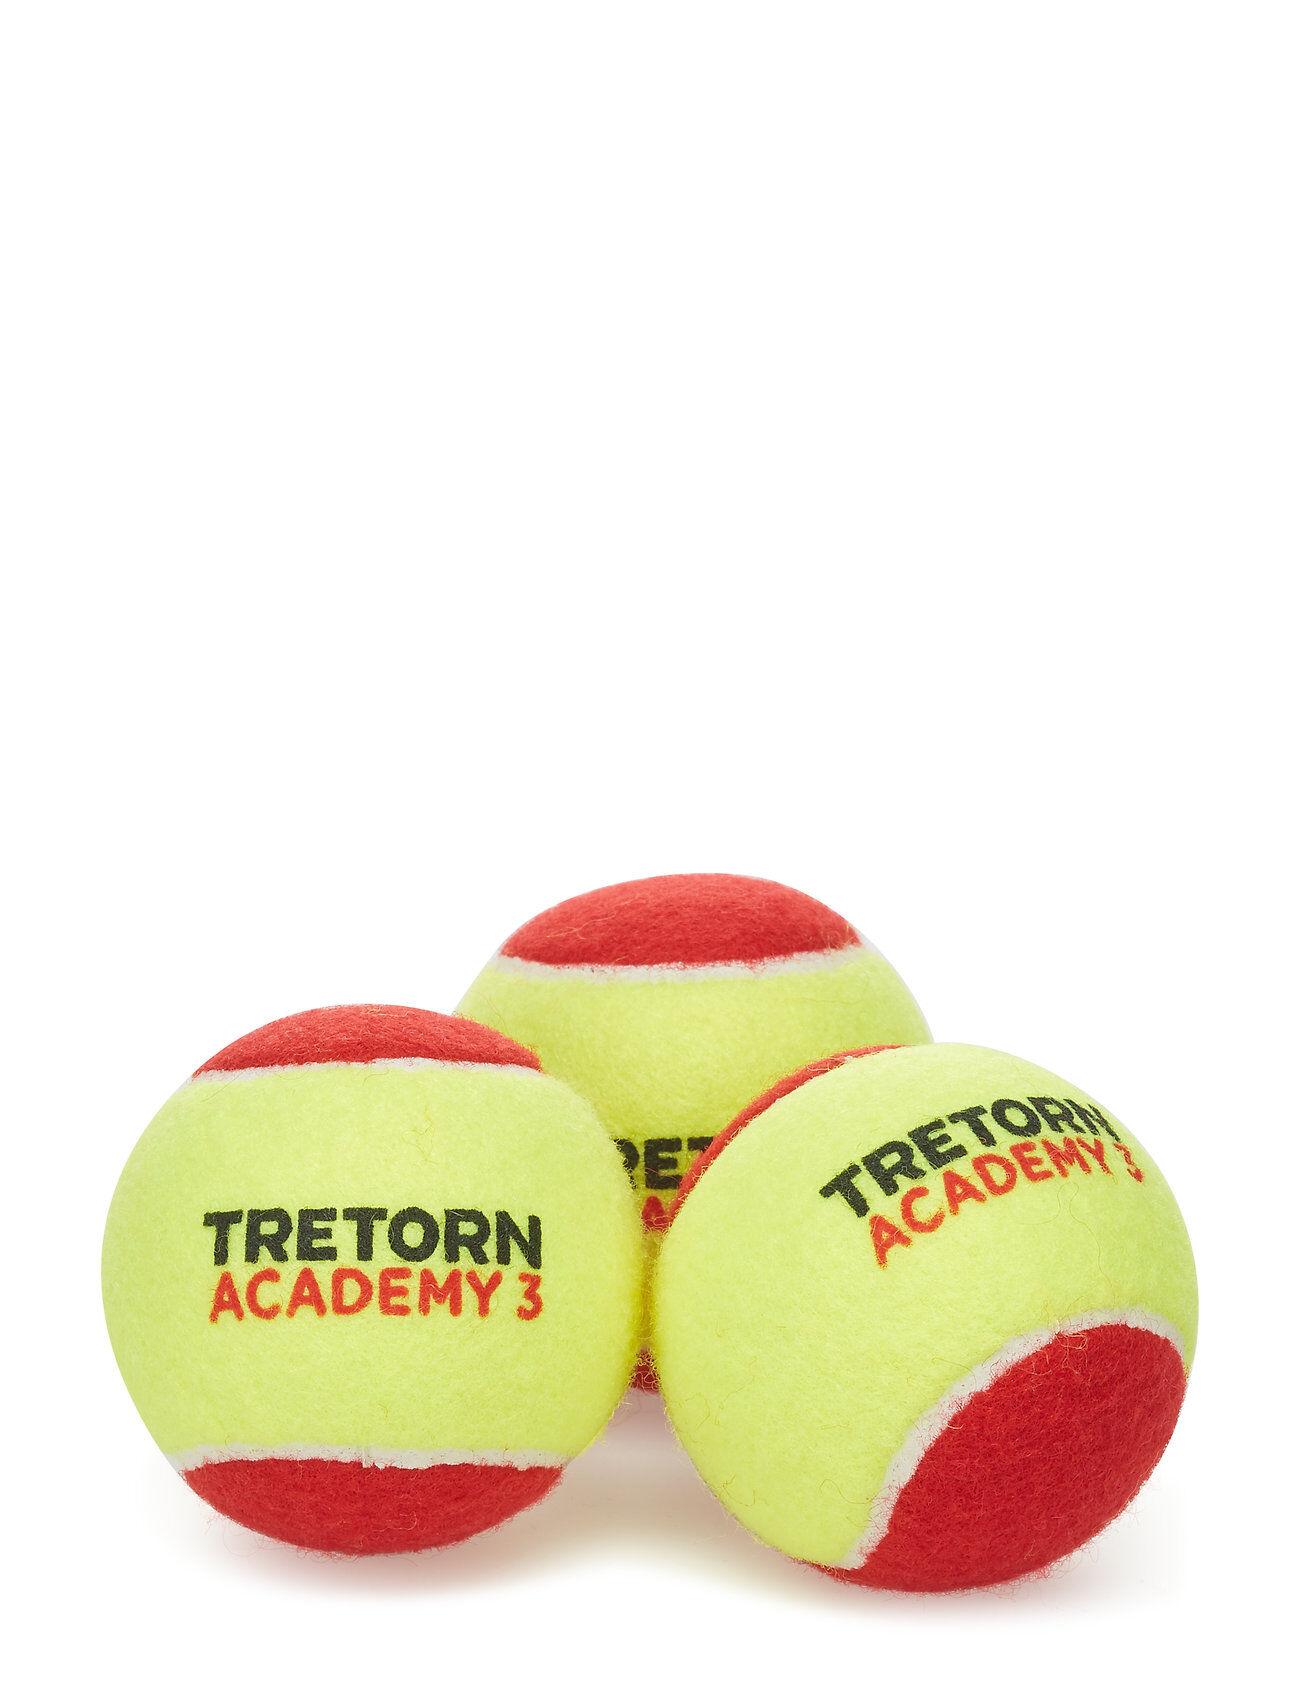 Tretorn Academy Red Felt 3 Pack